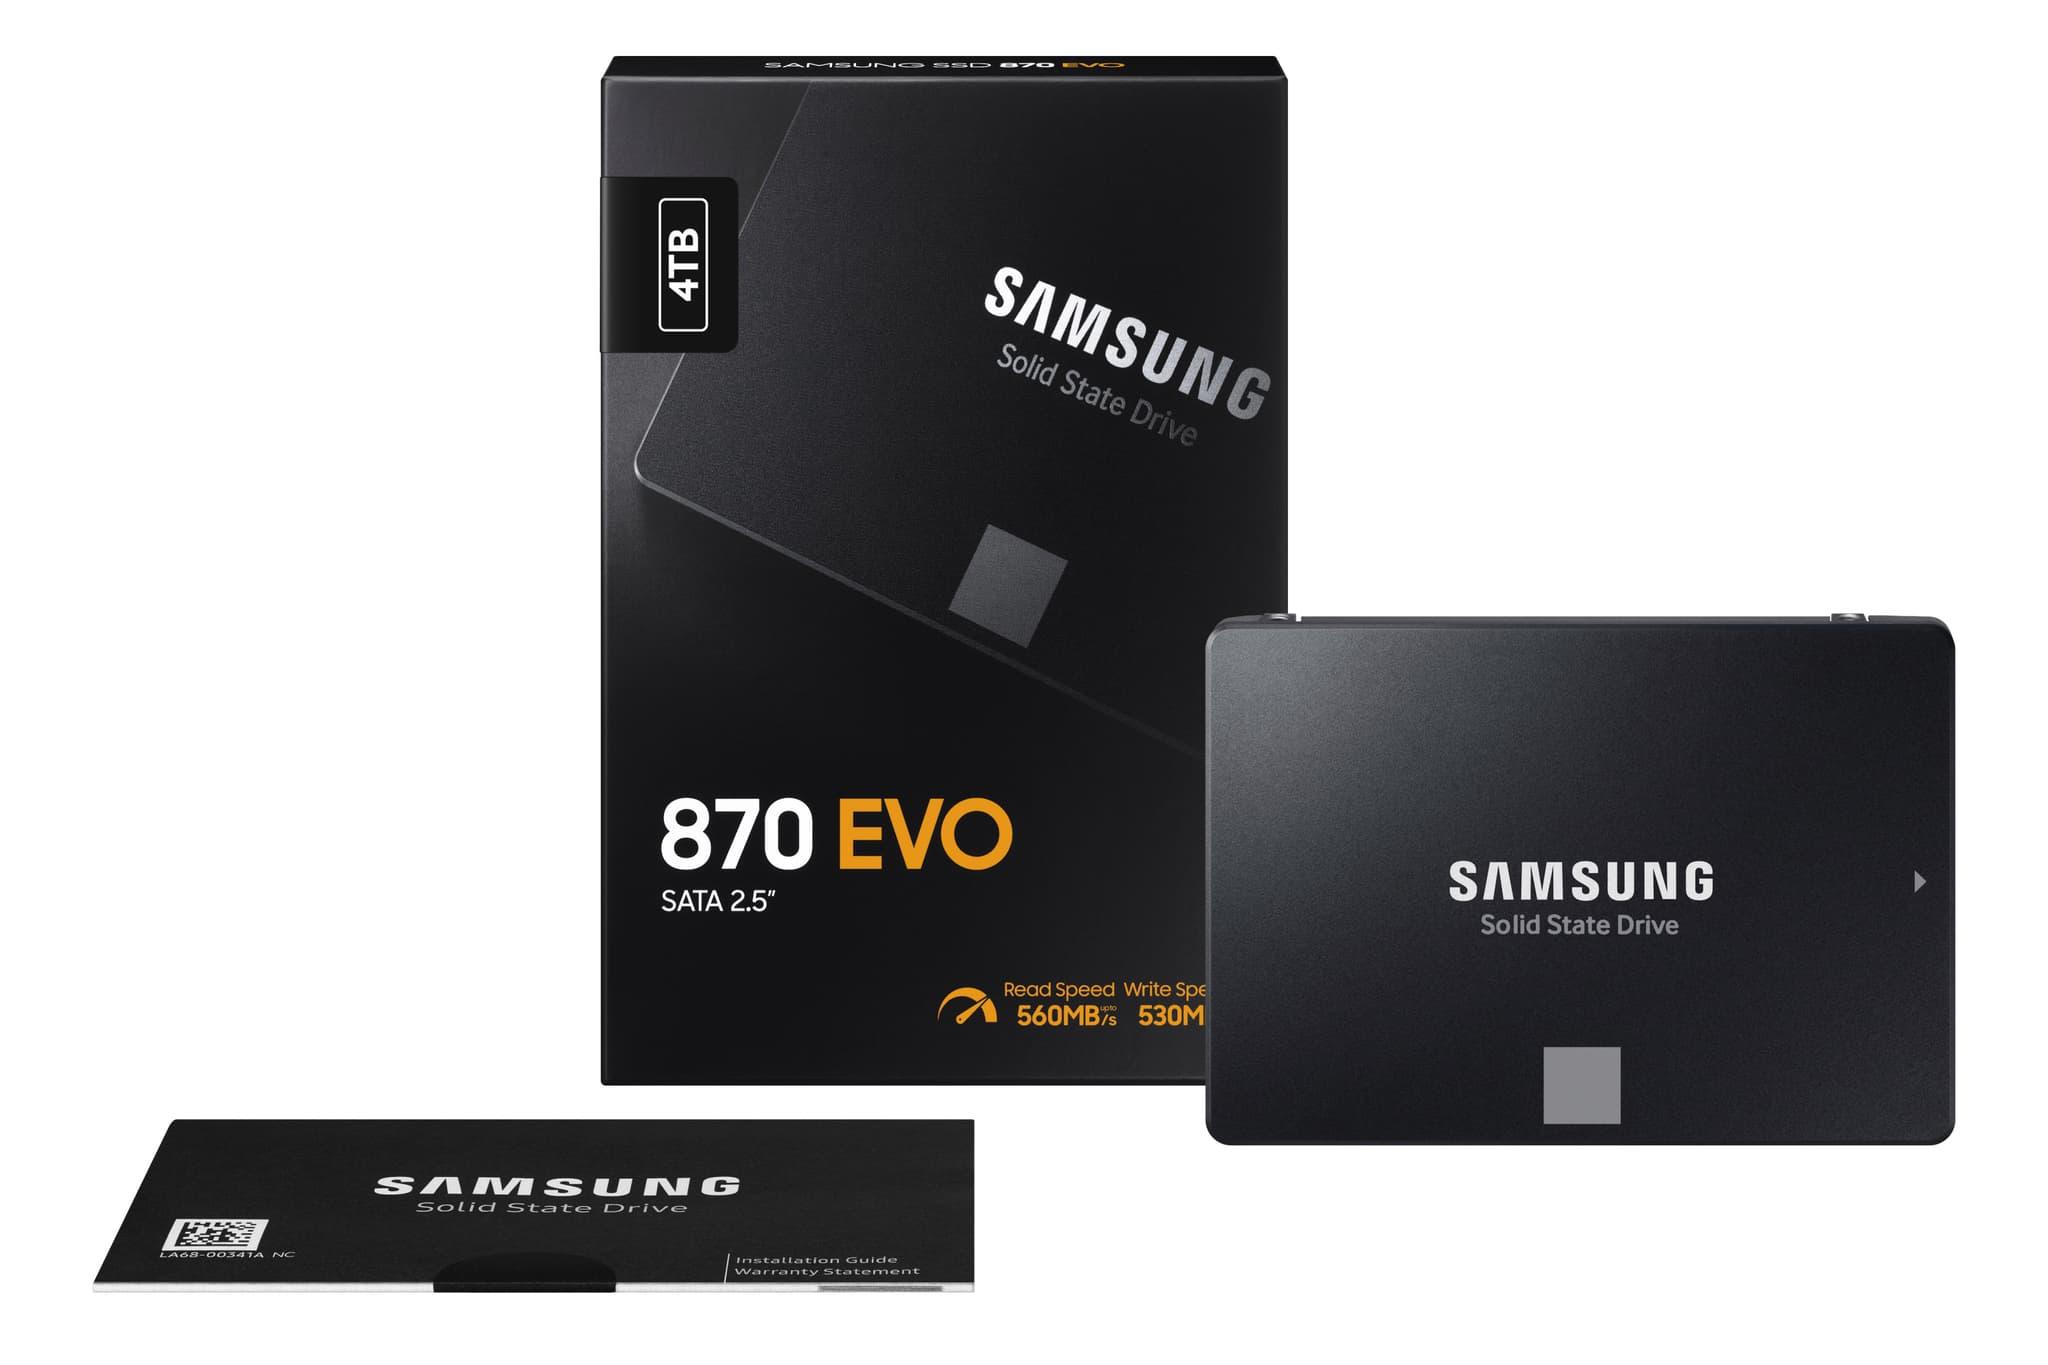 三星870 Evo SSD